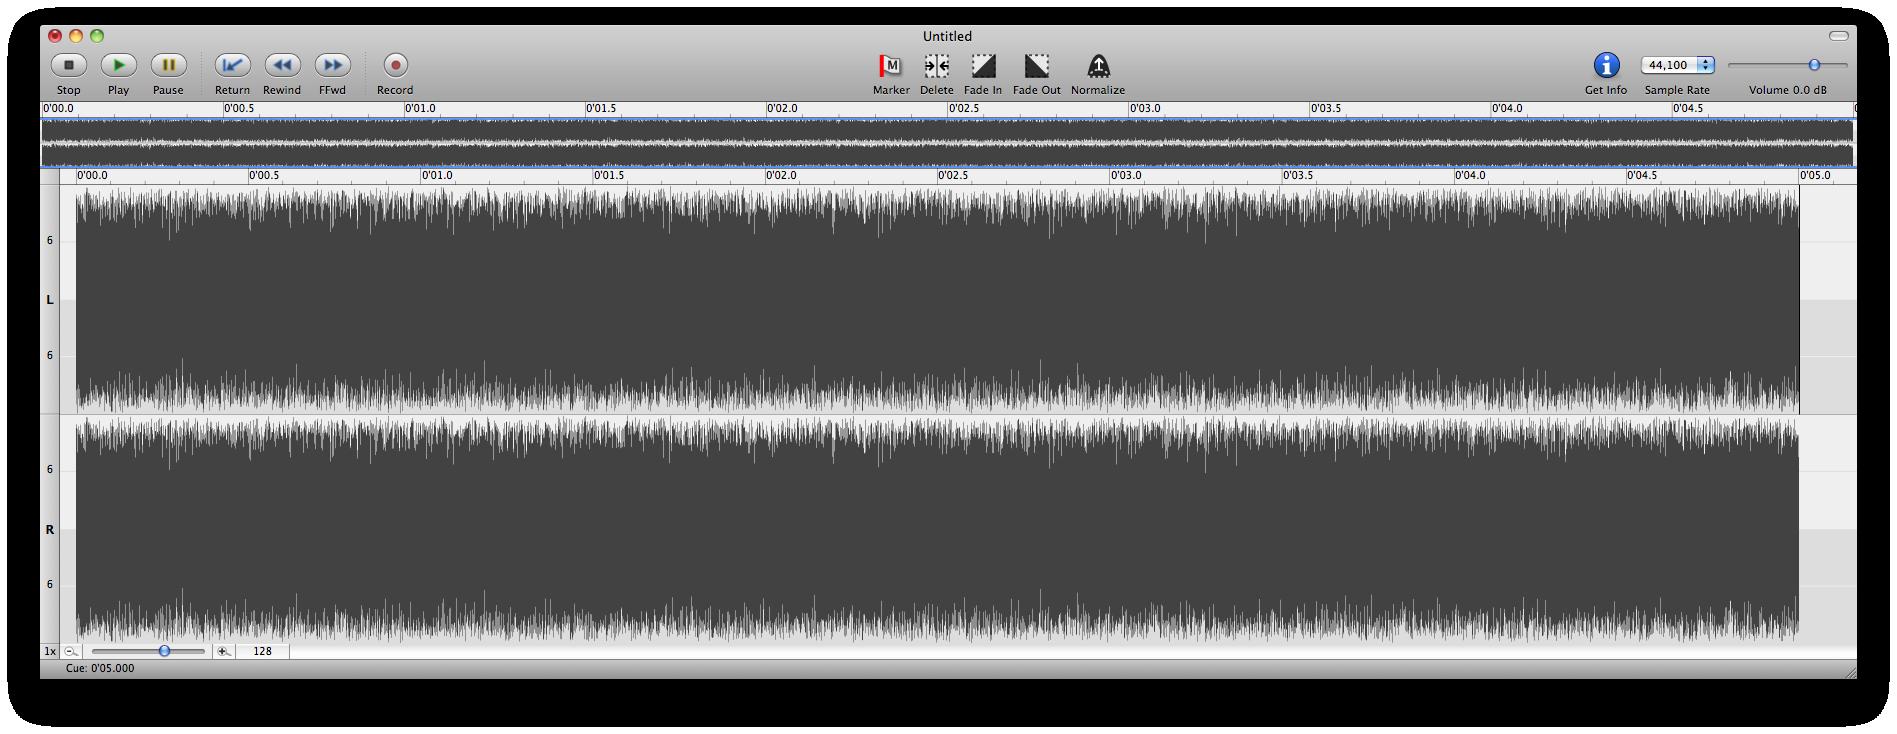 Noise - Waveform